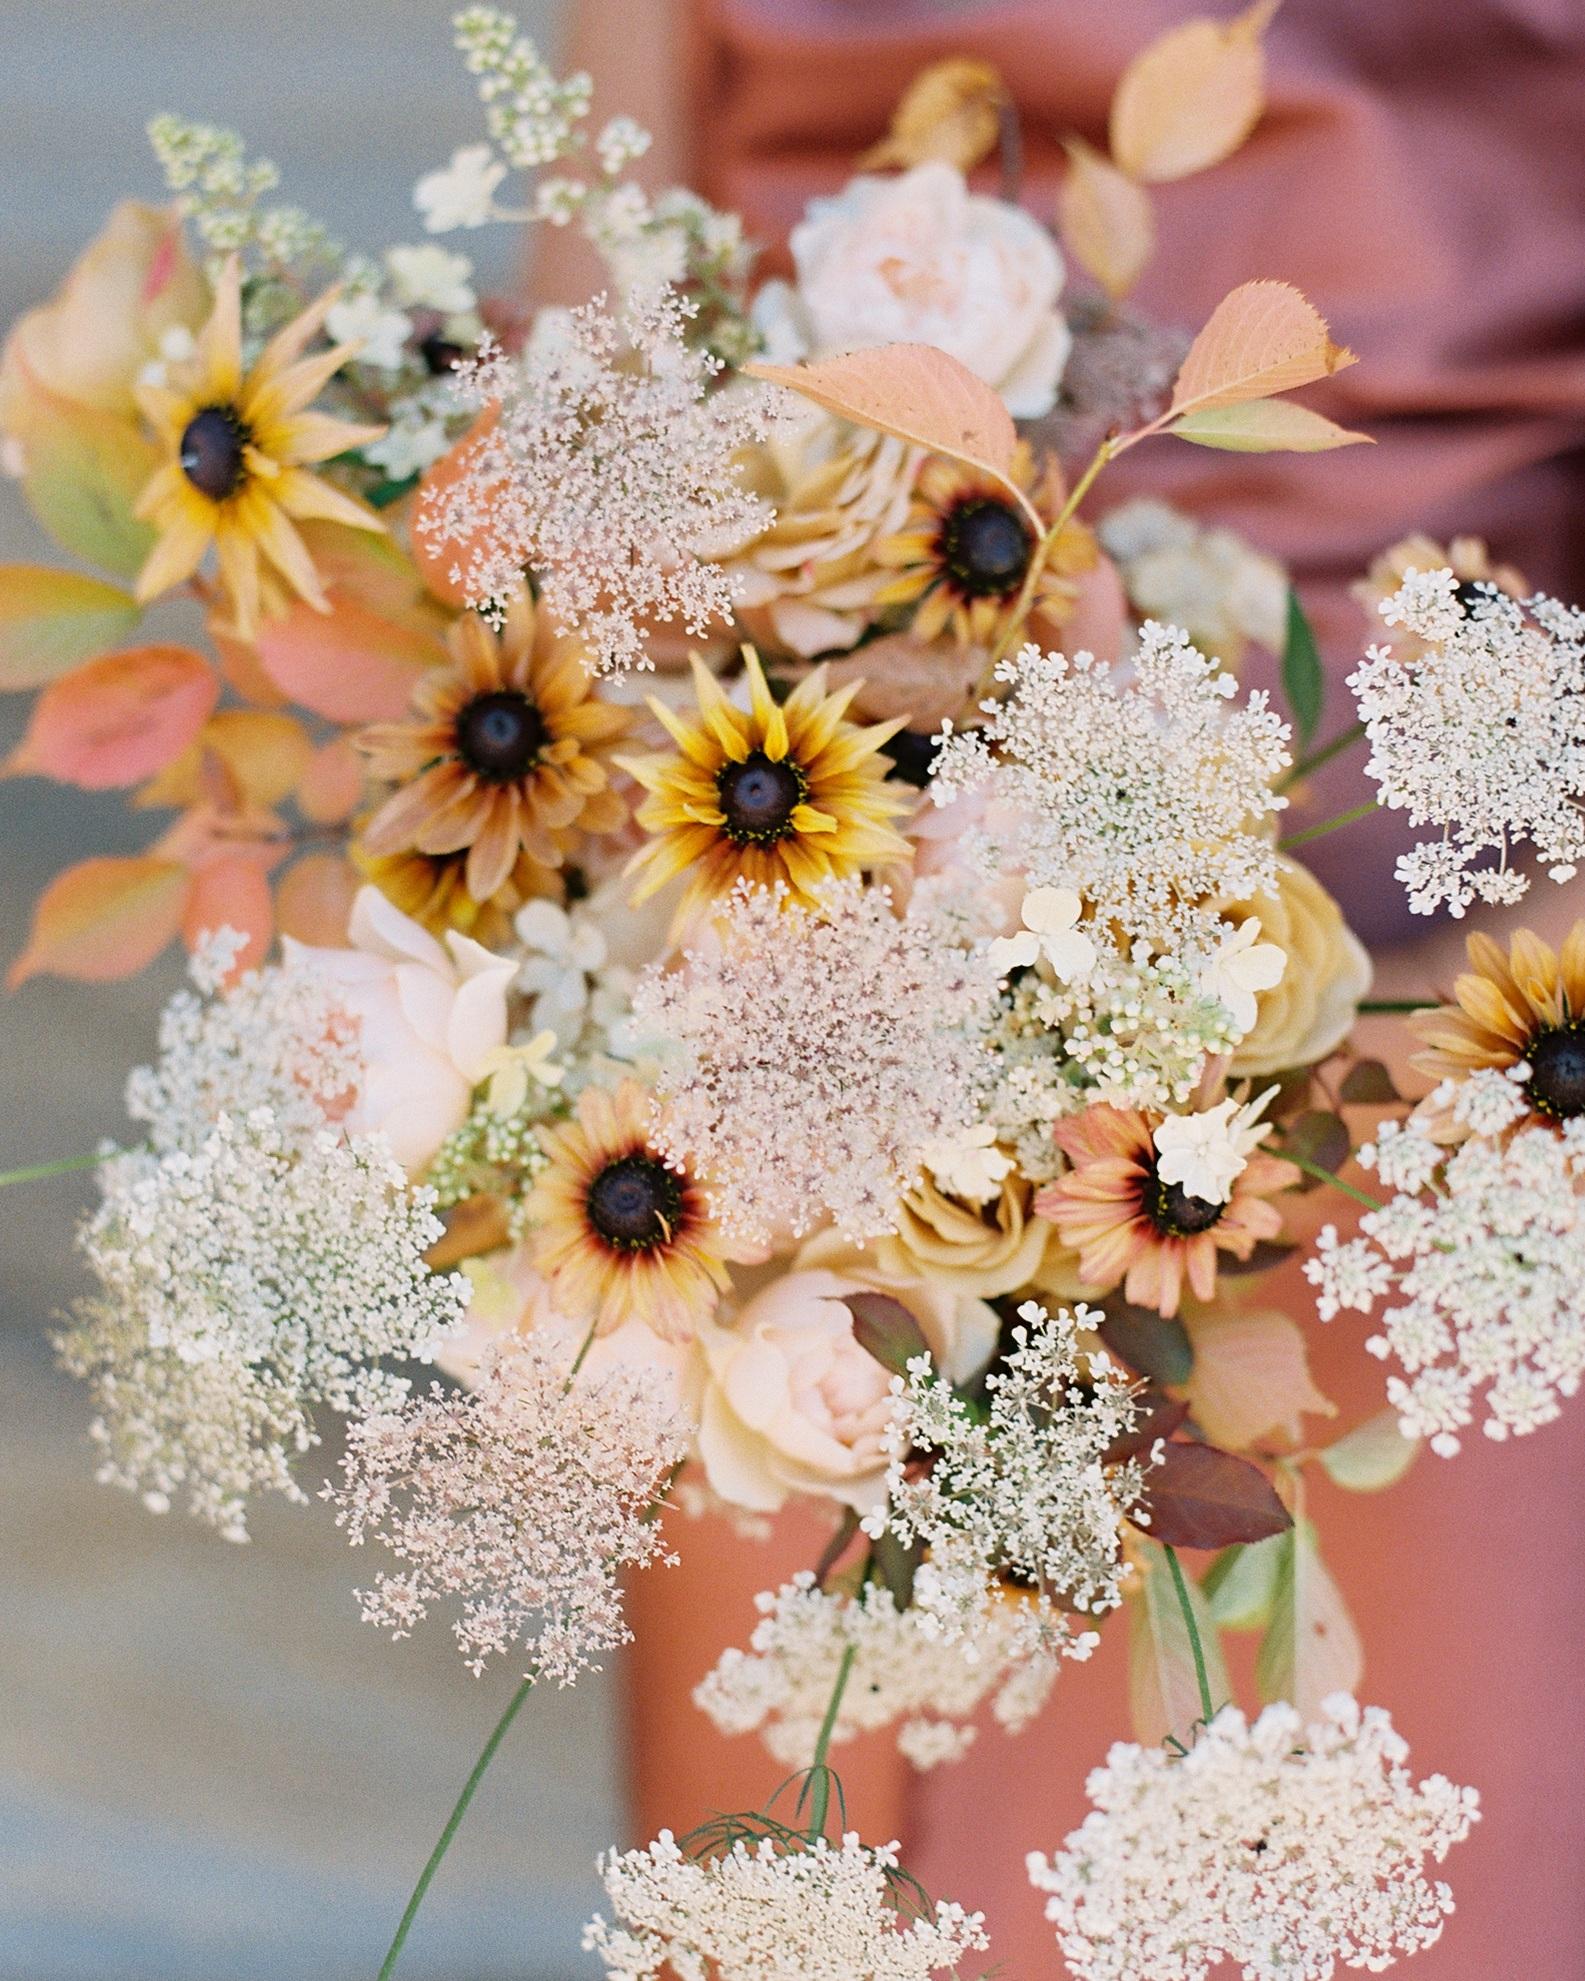 alice+beasley+flowers+cover+page.jpg